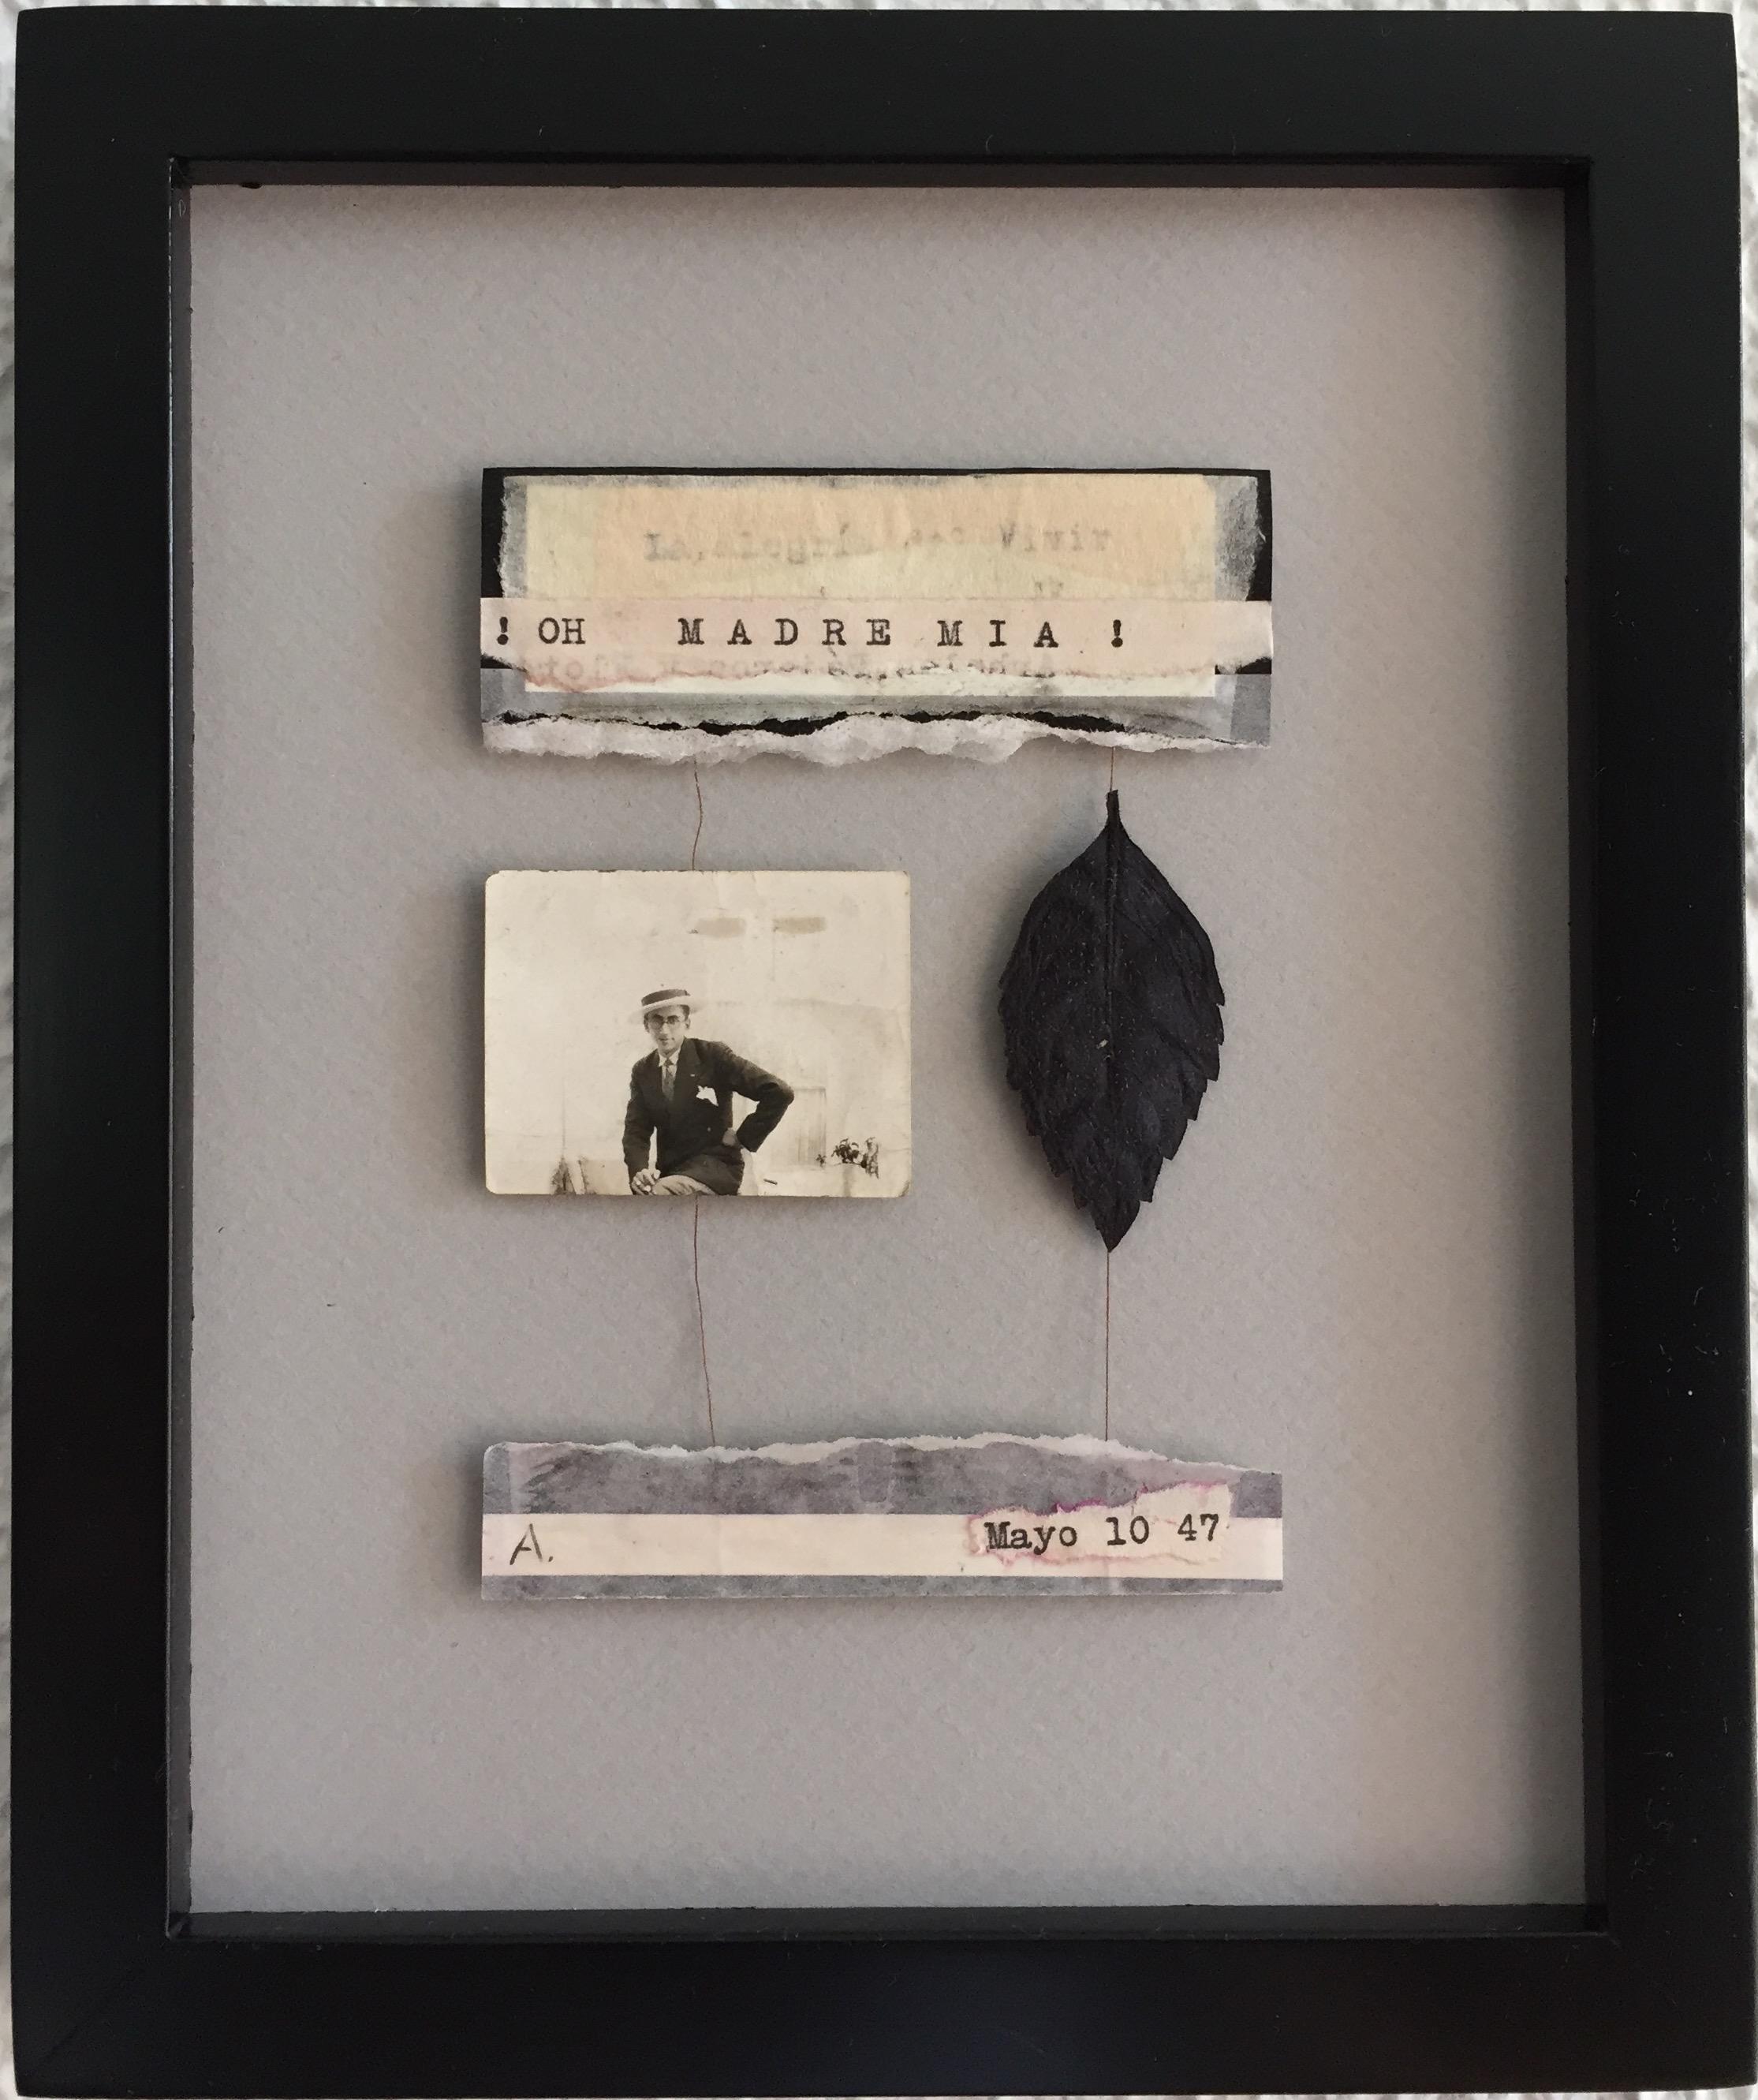 Serie de negativos polaroid Nº2